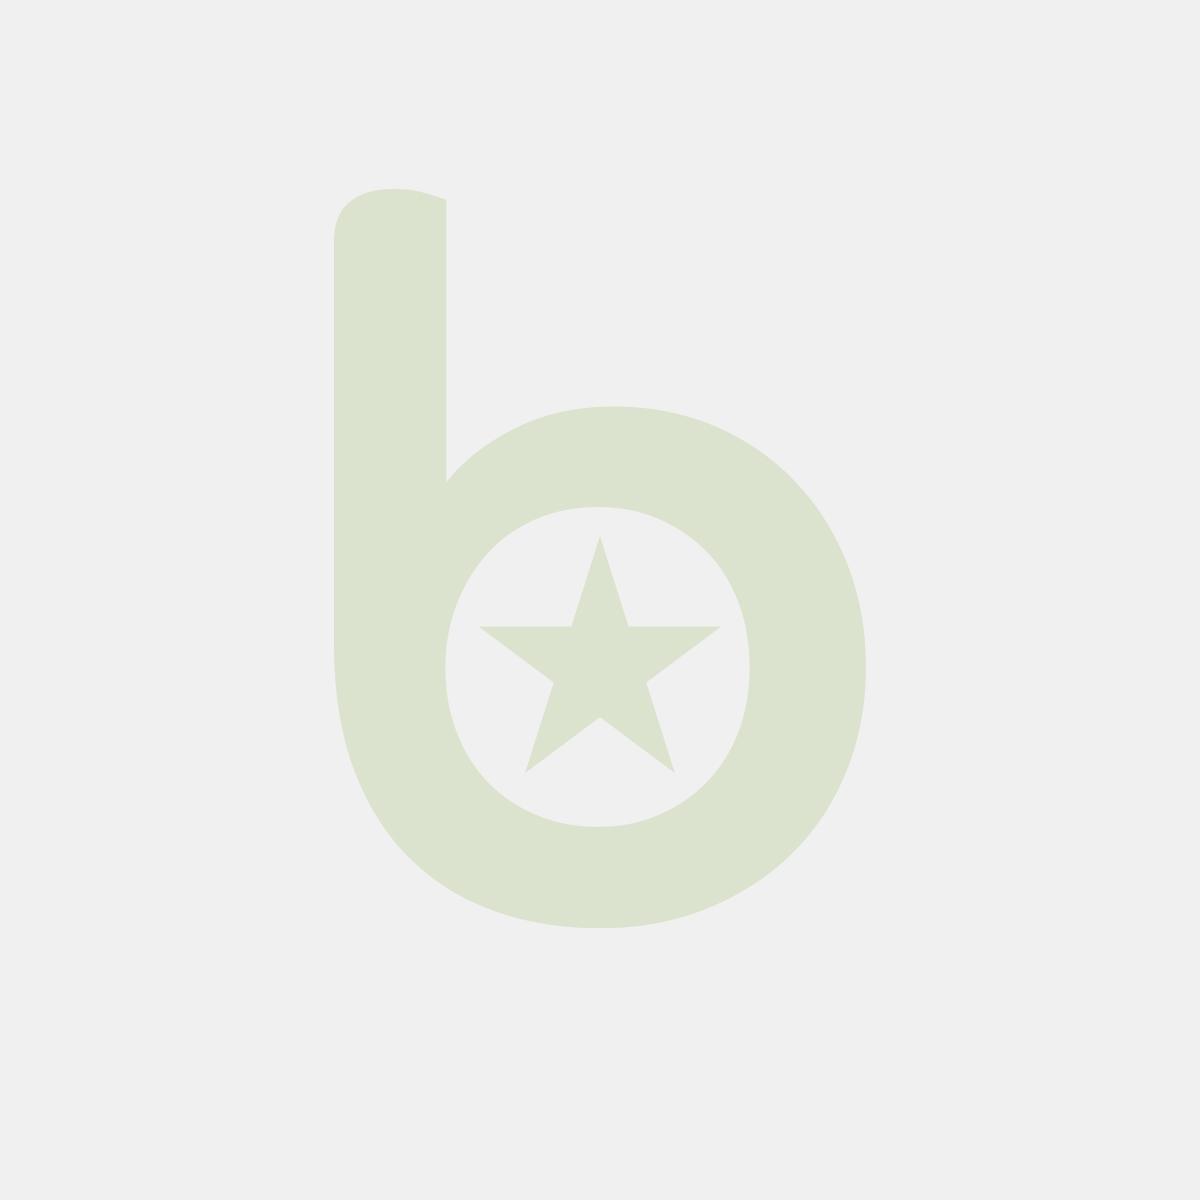 Koperty samoklejące (SK) NC, białe, 50 sztuk, C5, 14970/31421020